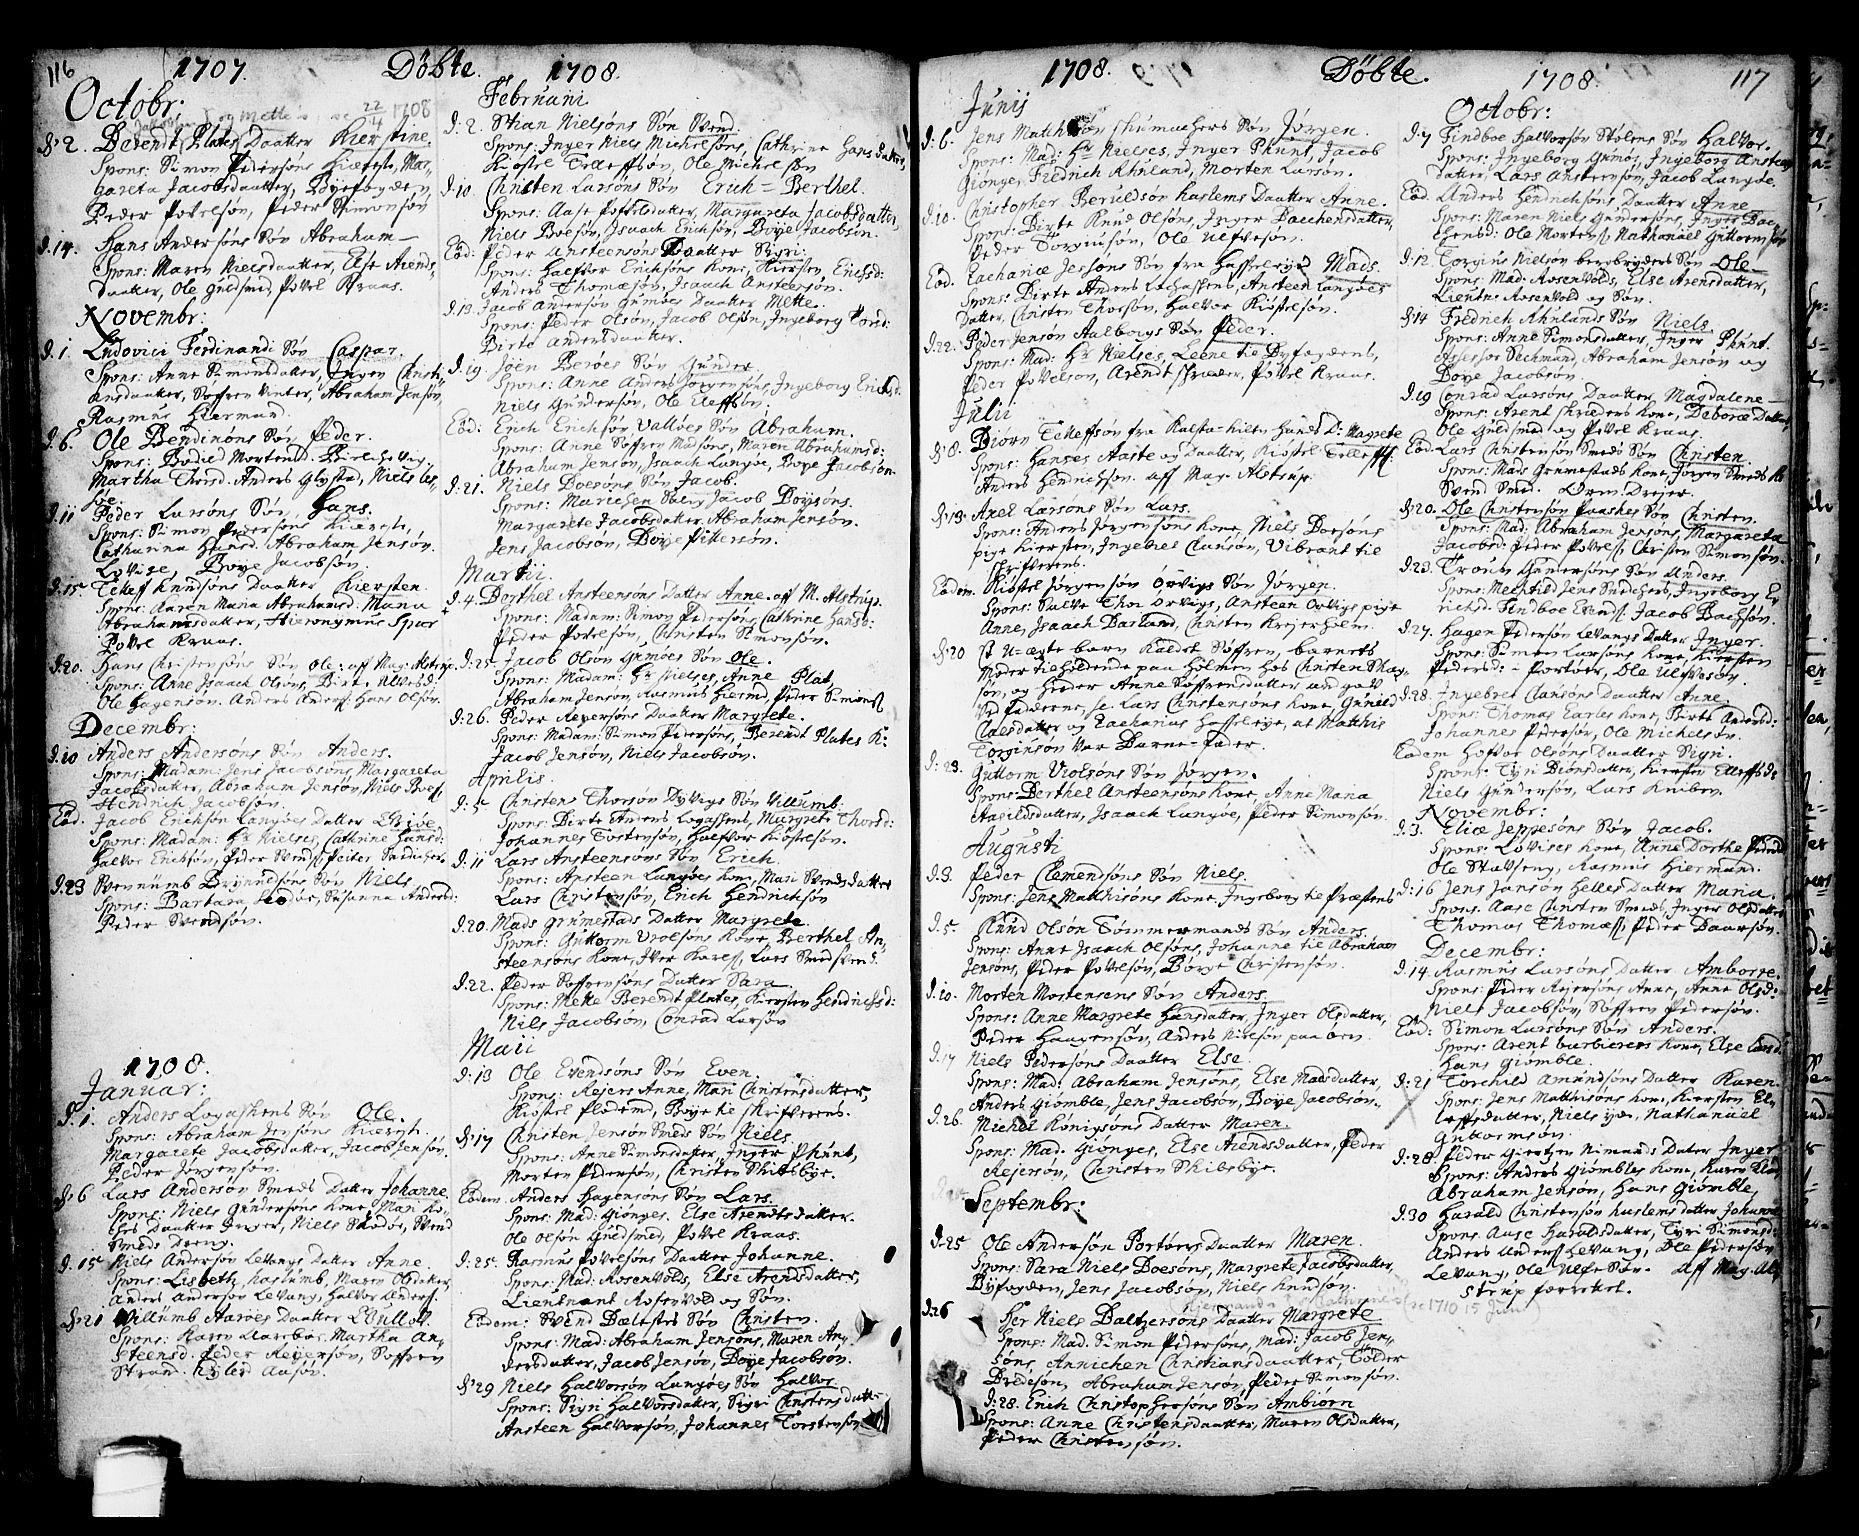 SAKO, Kragerø kirkebøker, F/Fa/L0001: Ministerialbok nr. 1, 1702-1766, s. 116-117